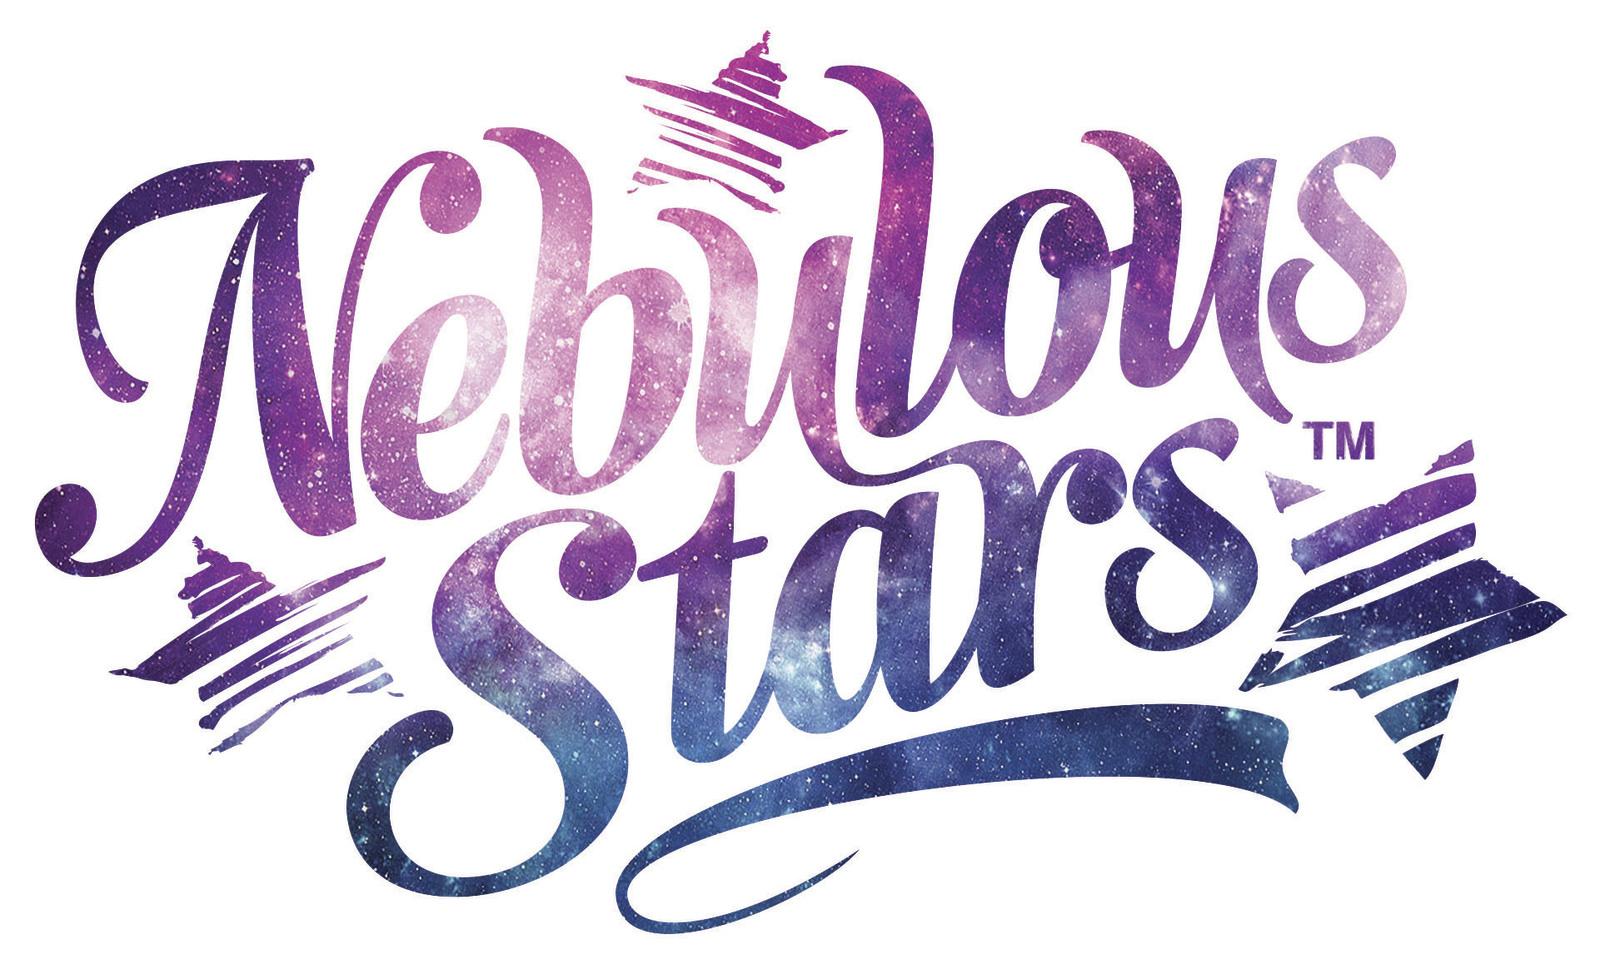 Nebulous Stars: Calming Putty - Petulia image